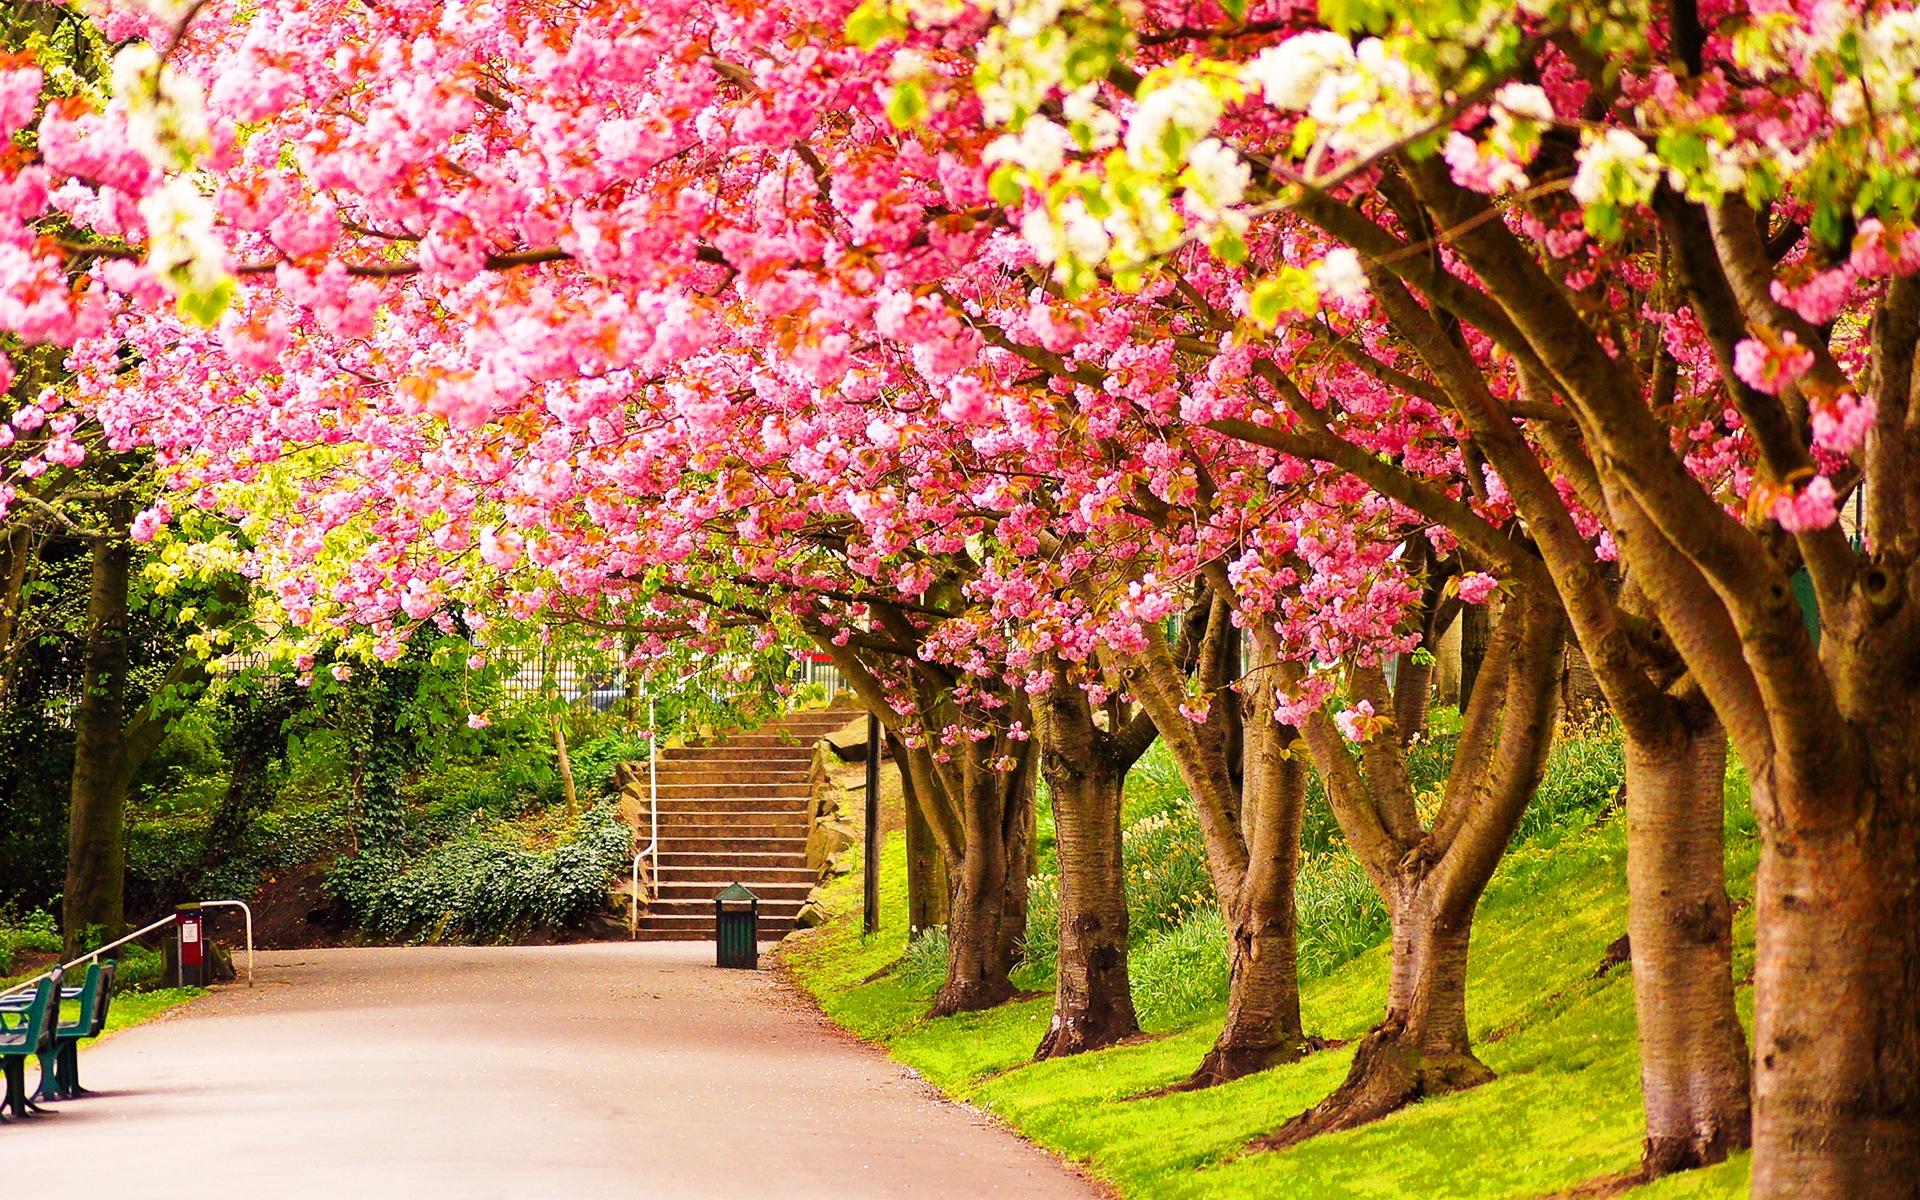 spring season wallpaper - sf wallpaper